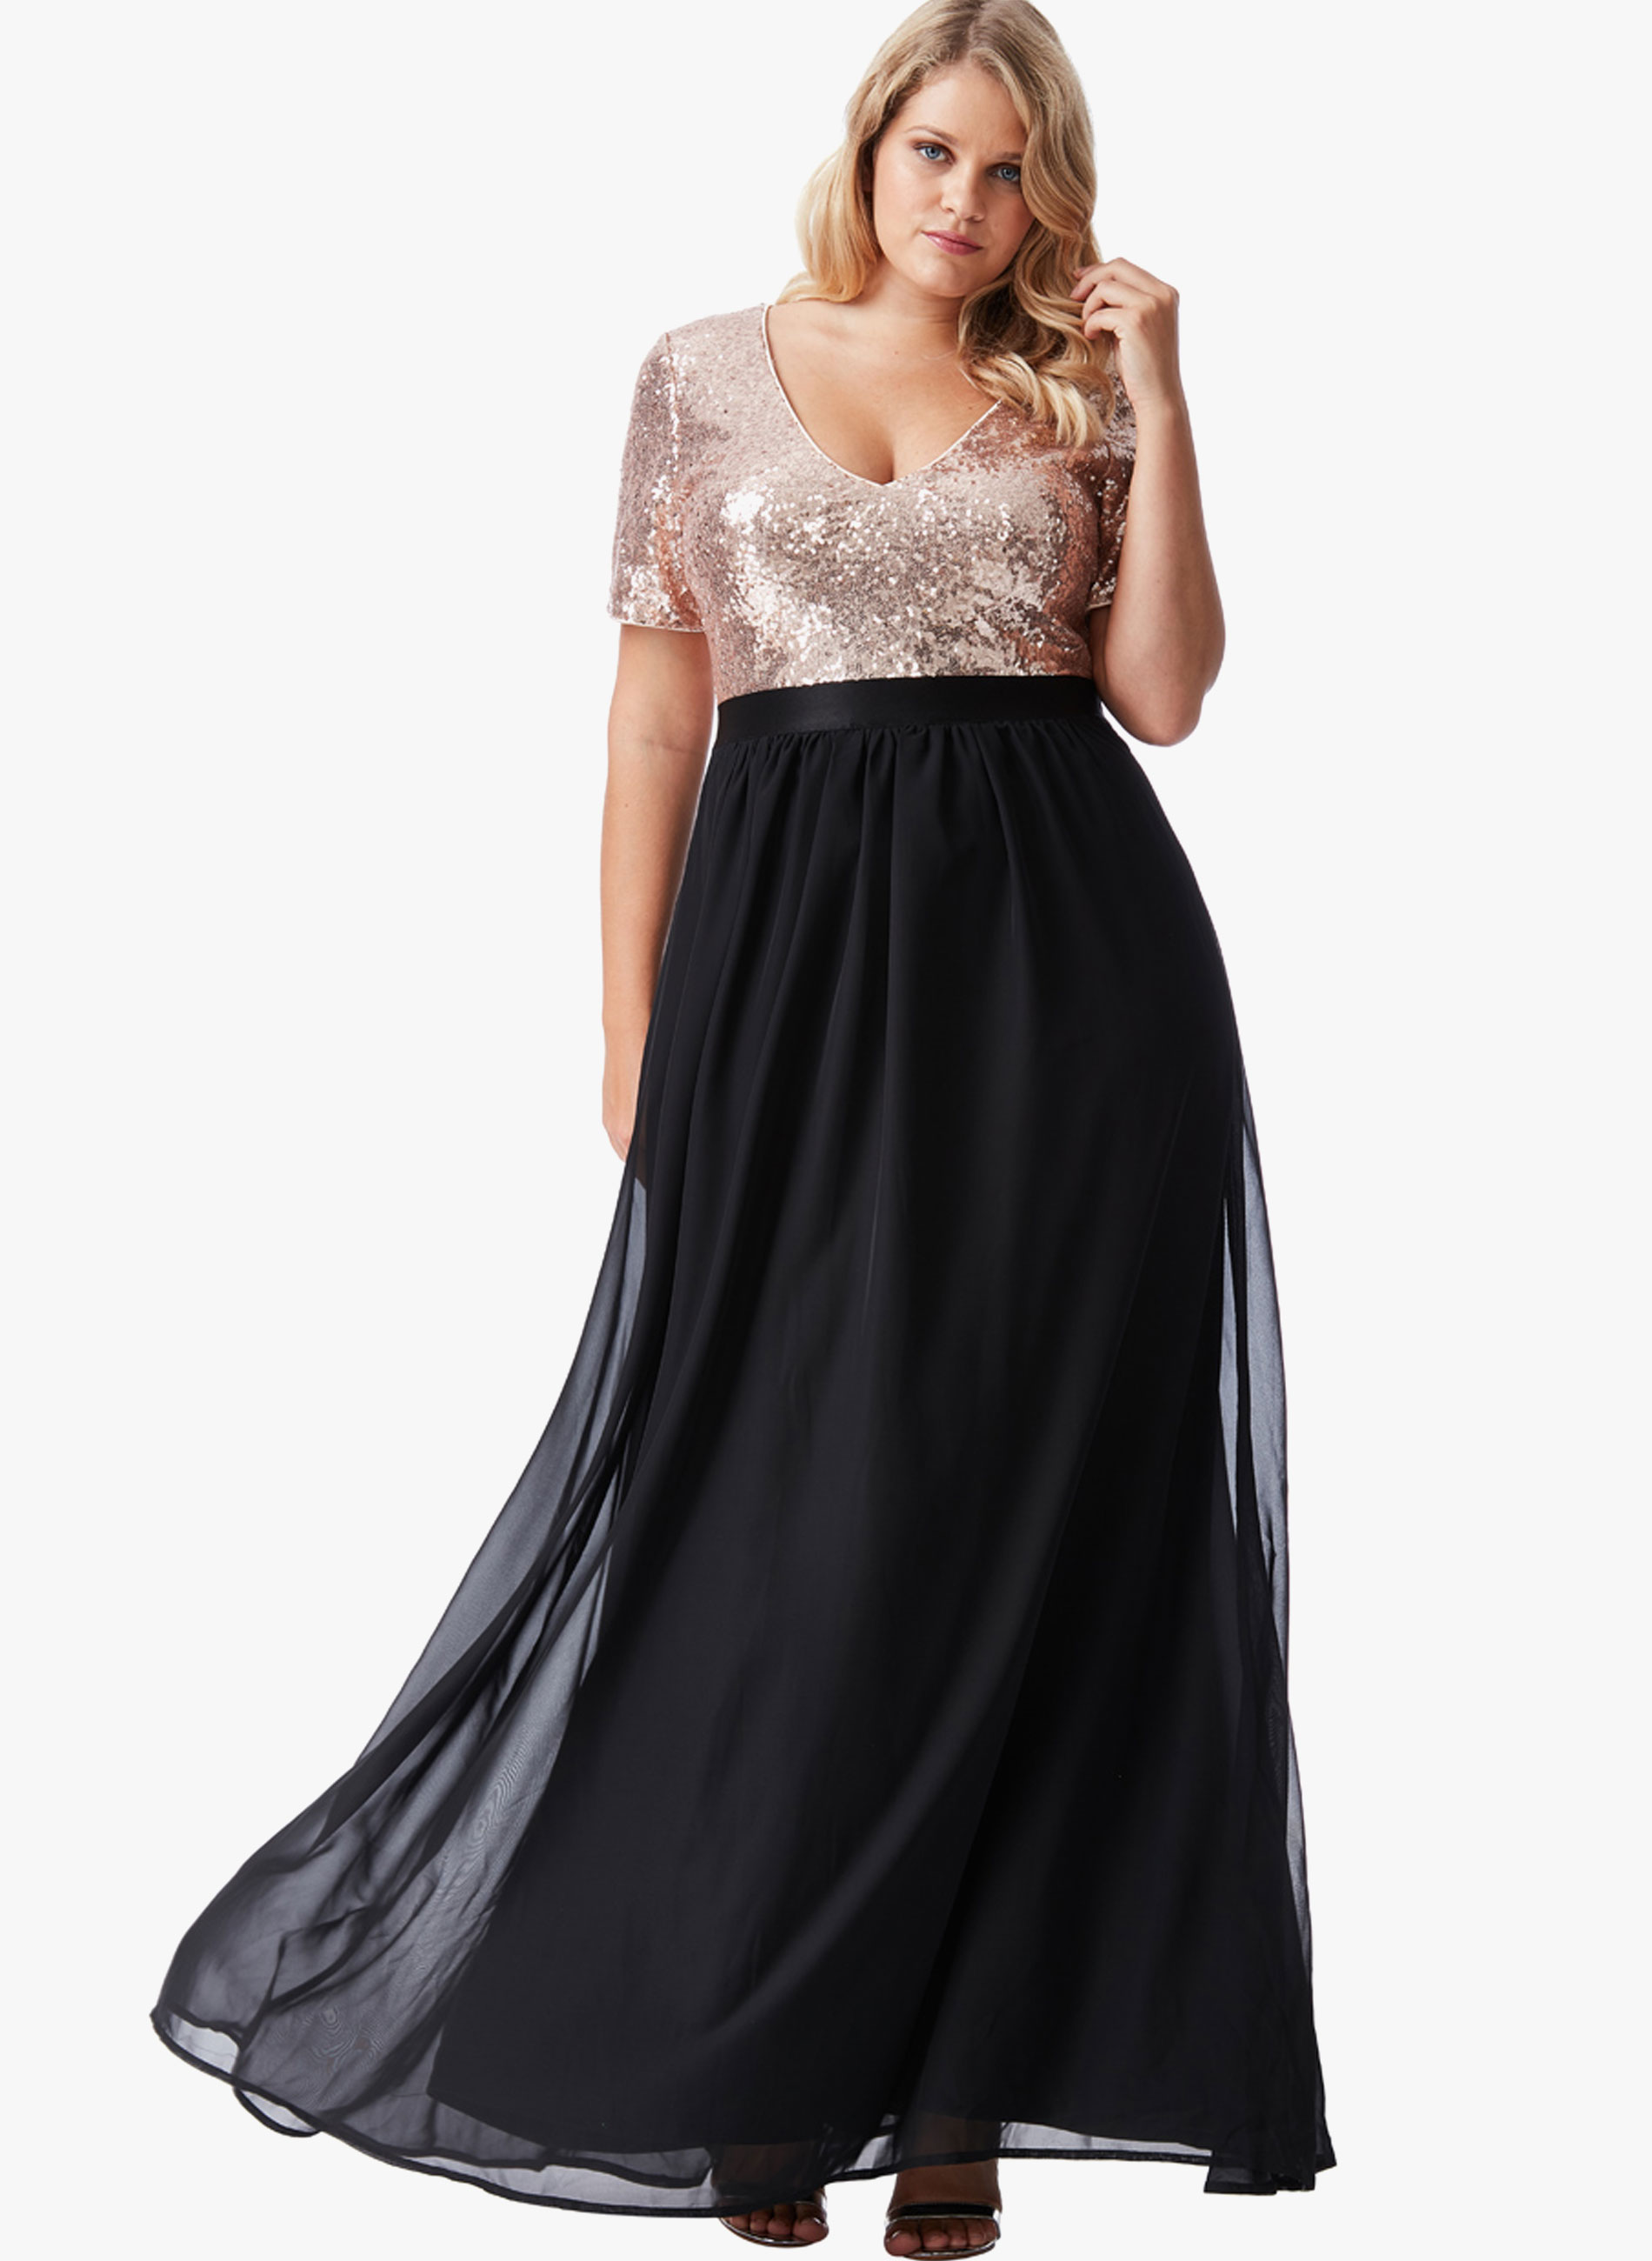 2877ad18037c ΜΕΓΑΛΑ ΜΕΓΕΘΗ ΦΟΡΕΜΑΤΑ    Φόρεμα Maxi με Χρυσή Παγιέτα - Μόδα σε ...